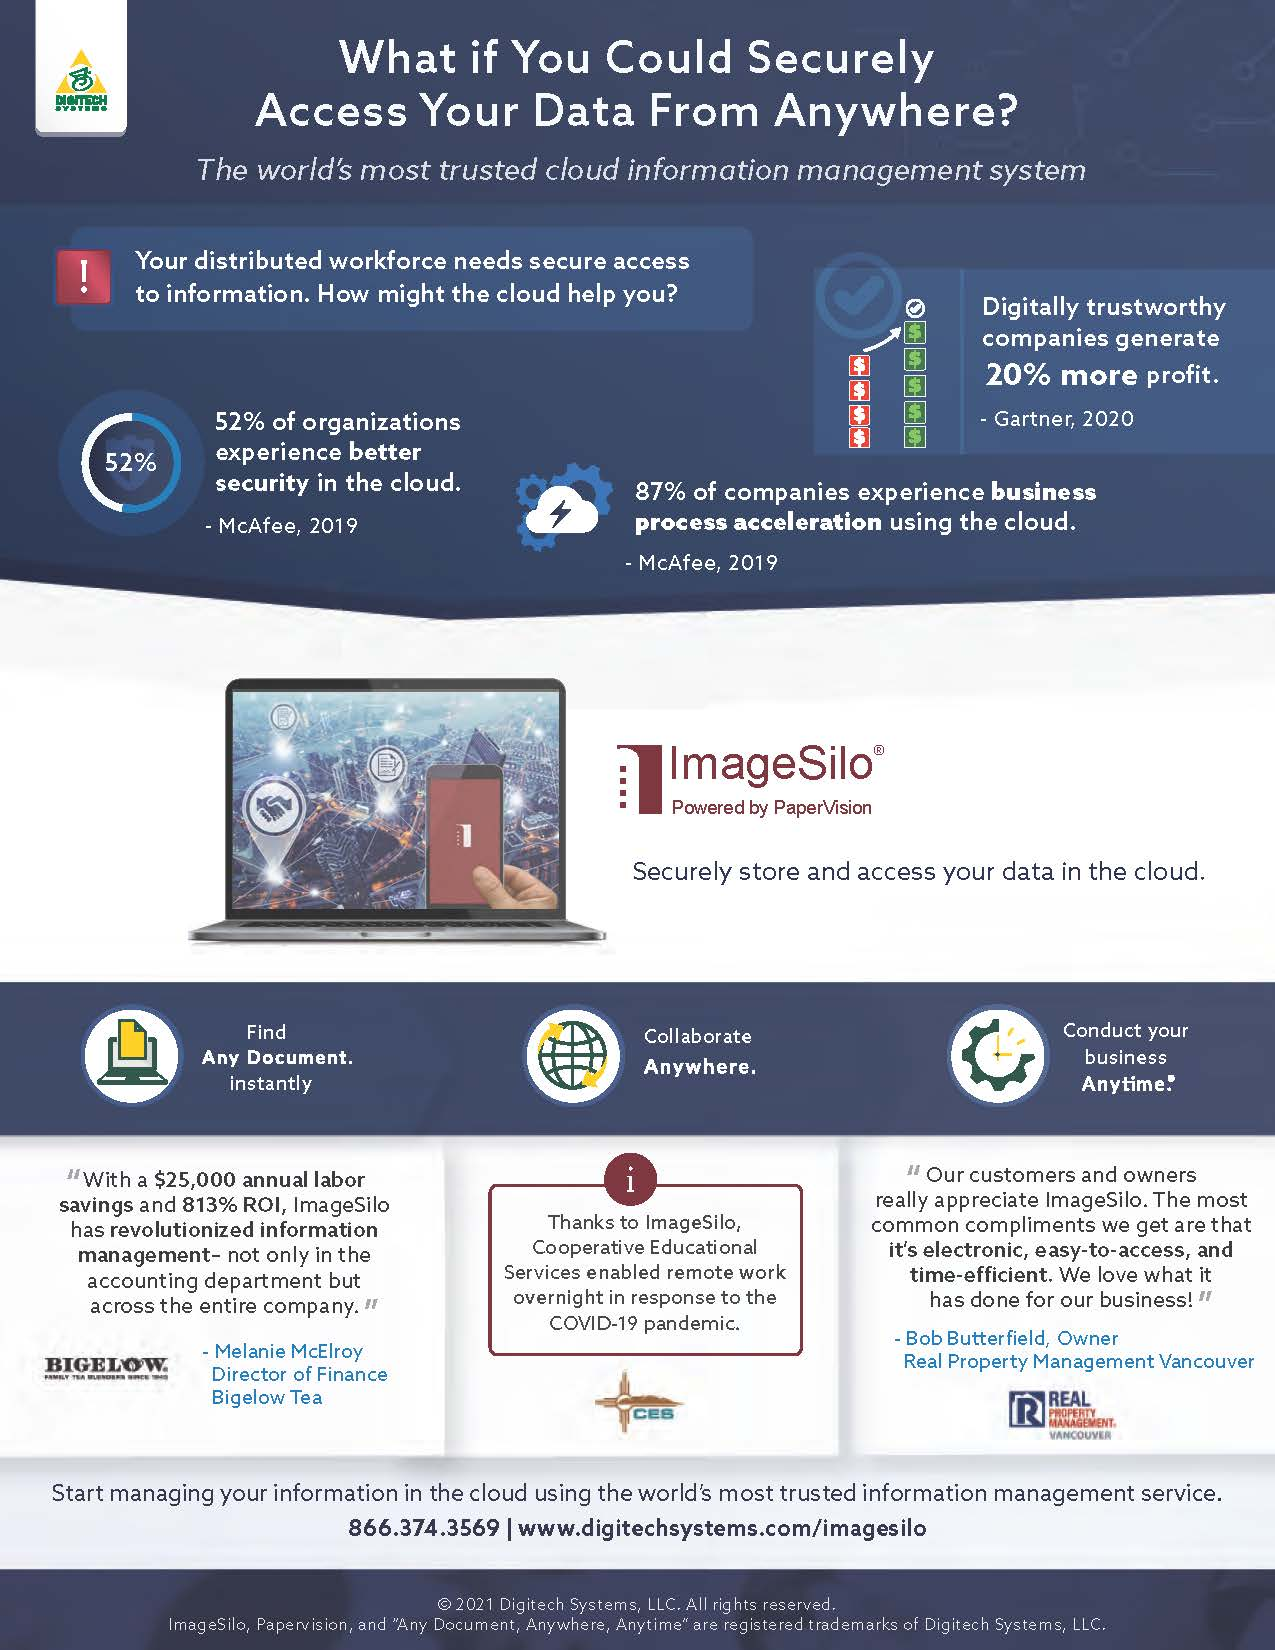 ImageSilo Infographic